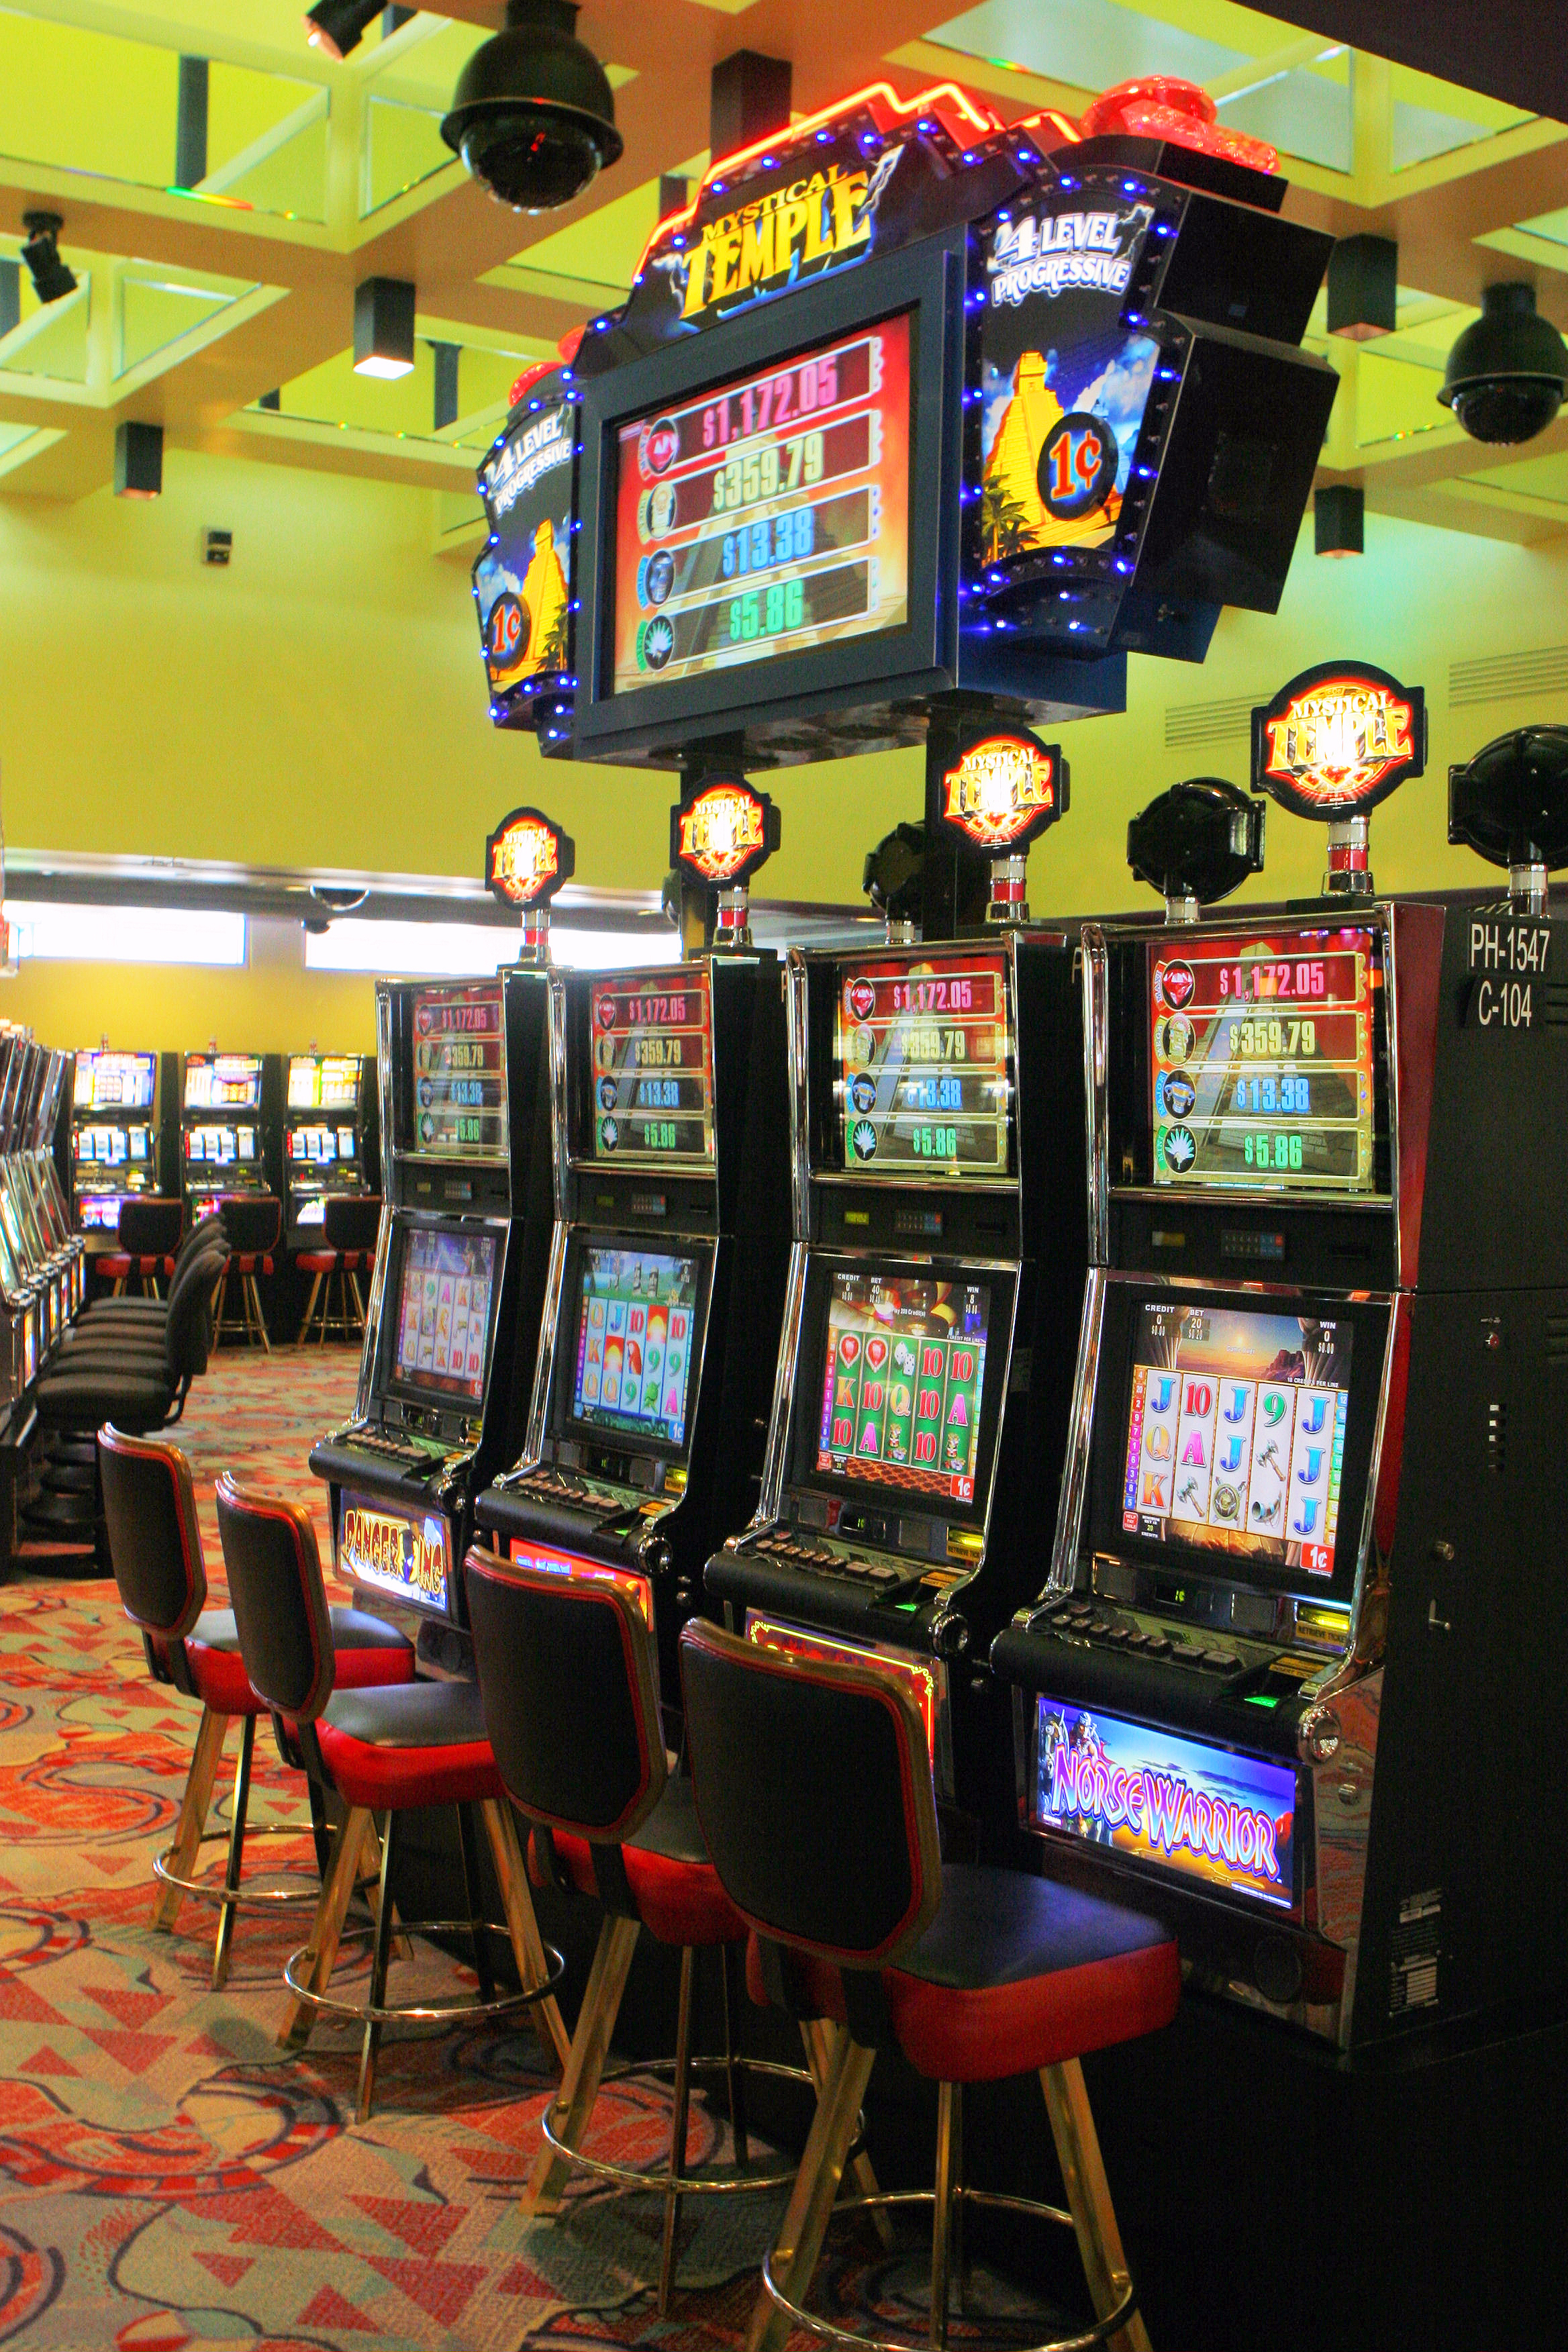 Ponce Hilton Casino Costa Caribe Puerto Rico